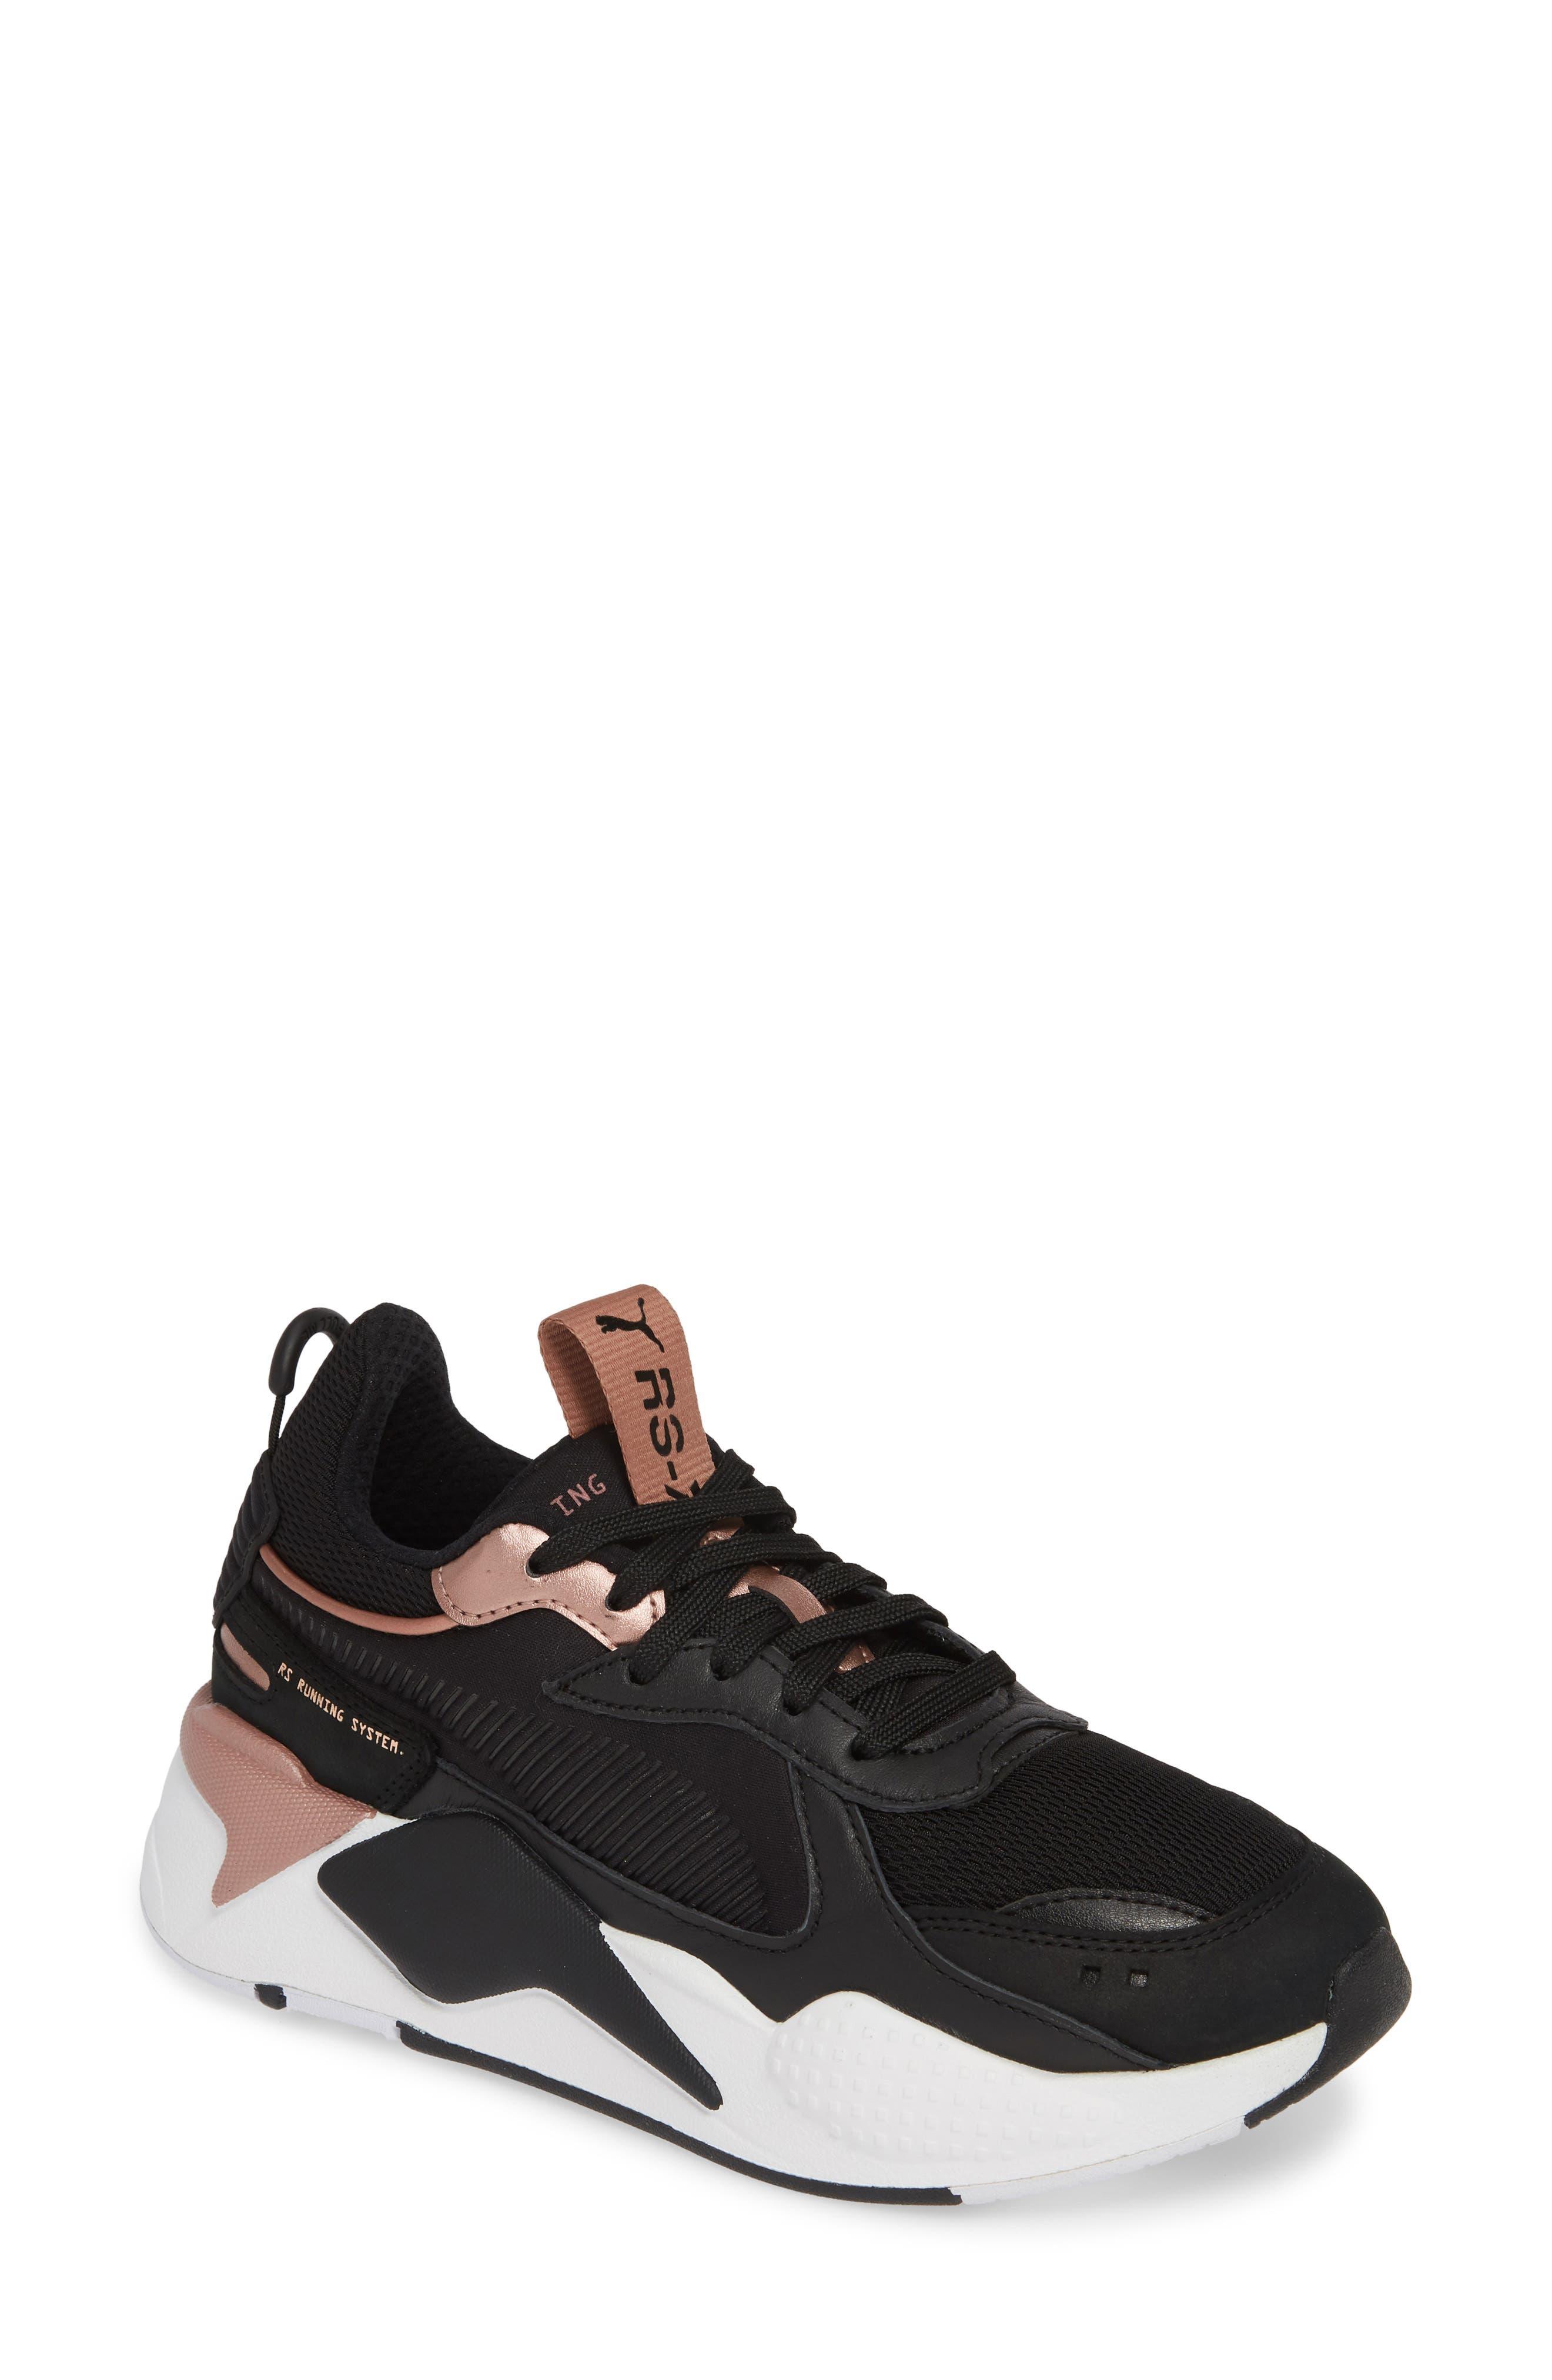 PUMA RS-X Trophy Sneaker, Main, color, BLACK/ ROSE GOLD